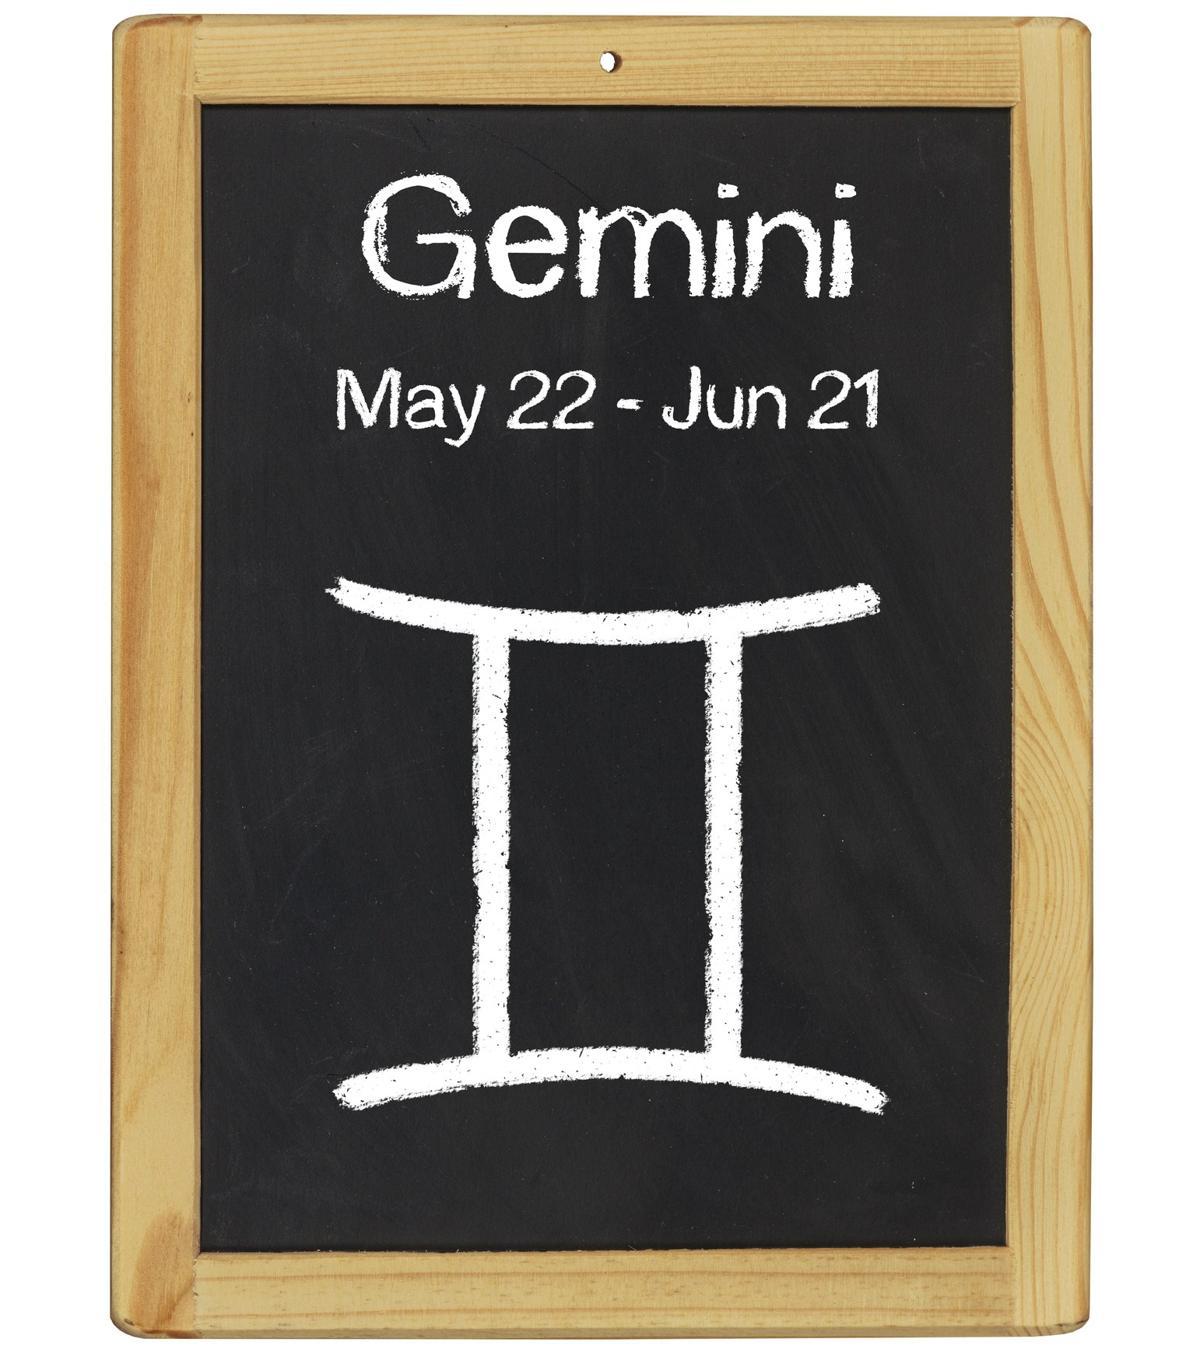 Gemini dates of birth range in Perth